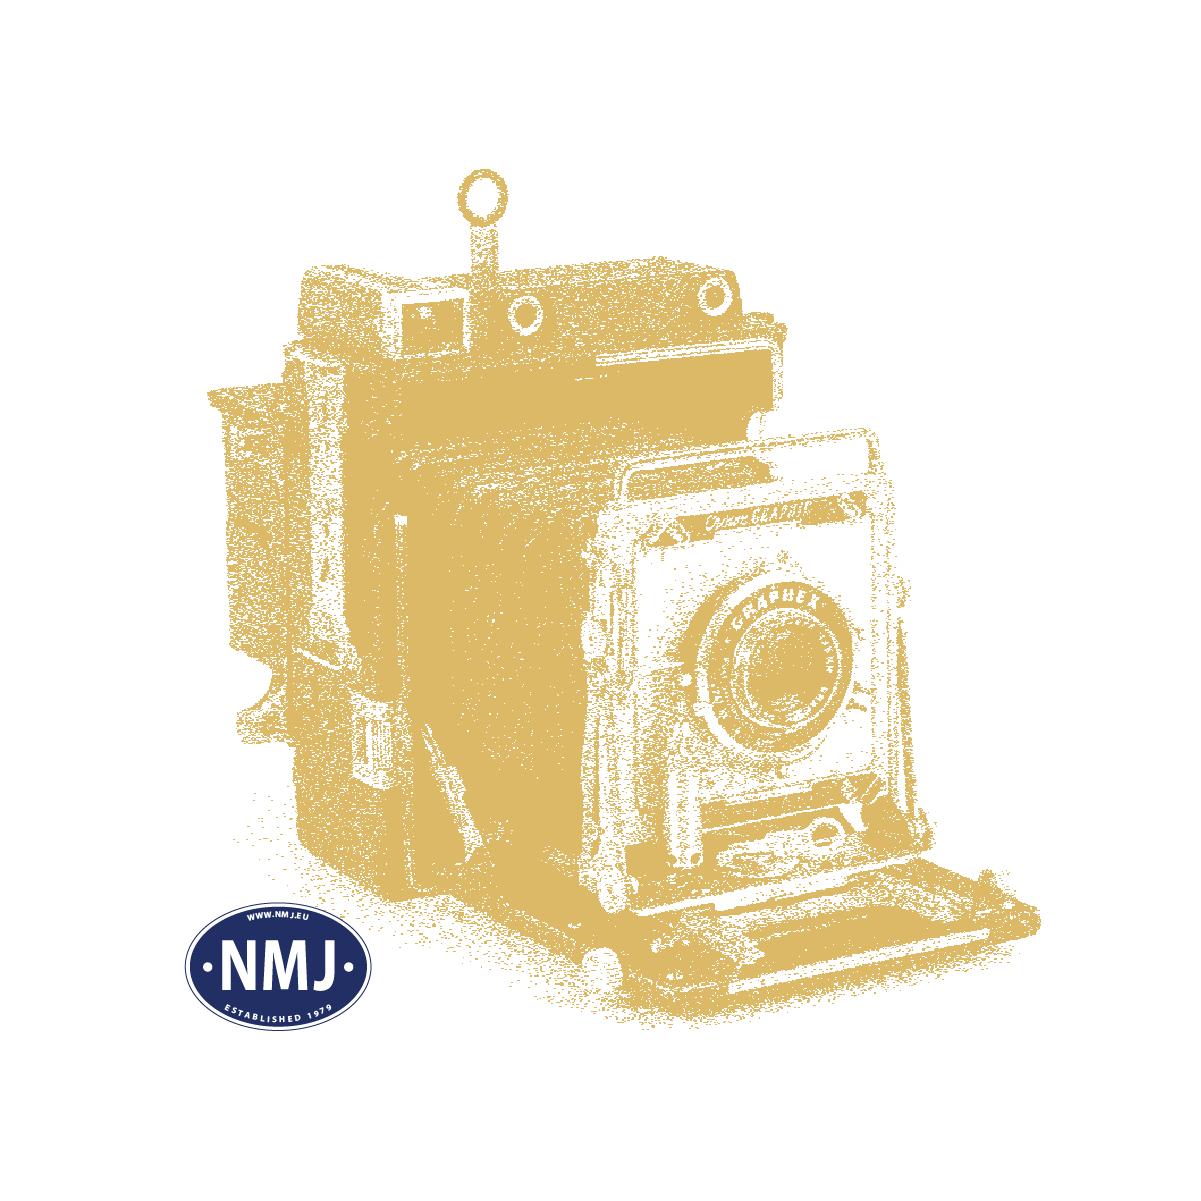 NMJT85.202AC - NMJ Topline CargoNet Di8.707, AC Digital